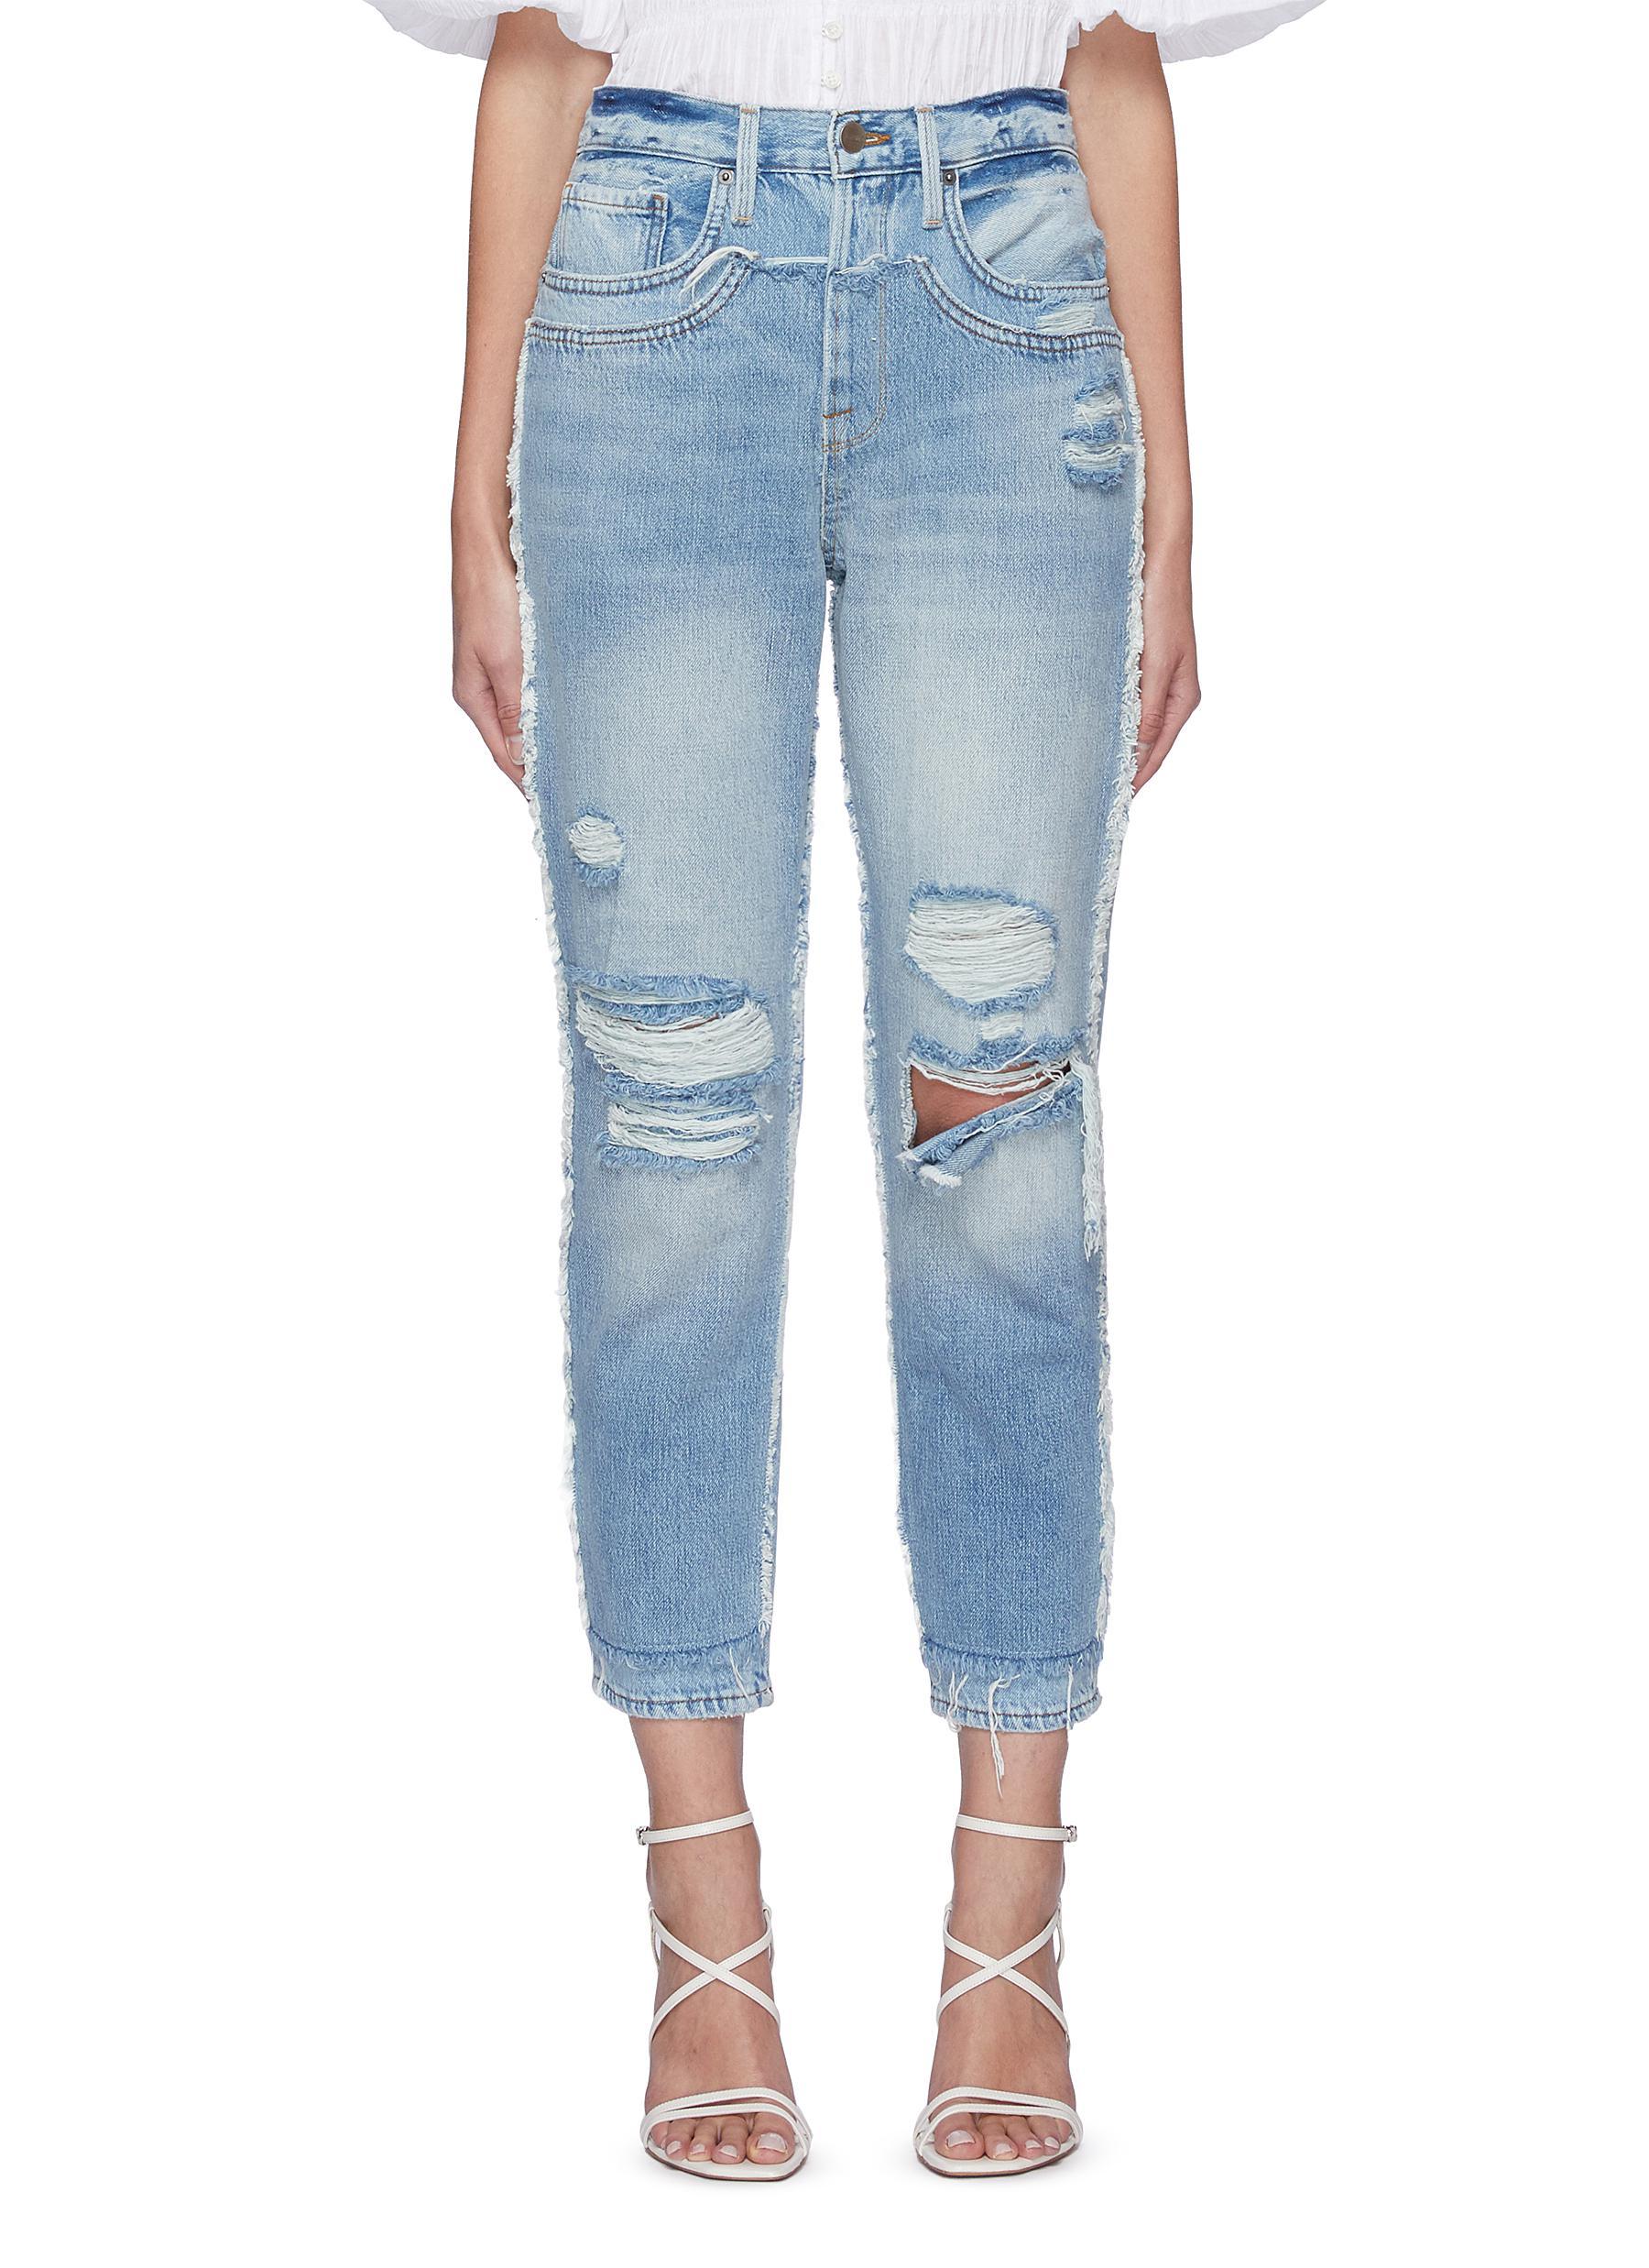 Fray hem distress light wash jeans